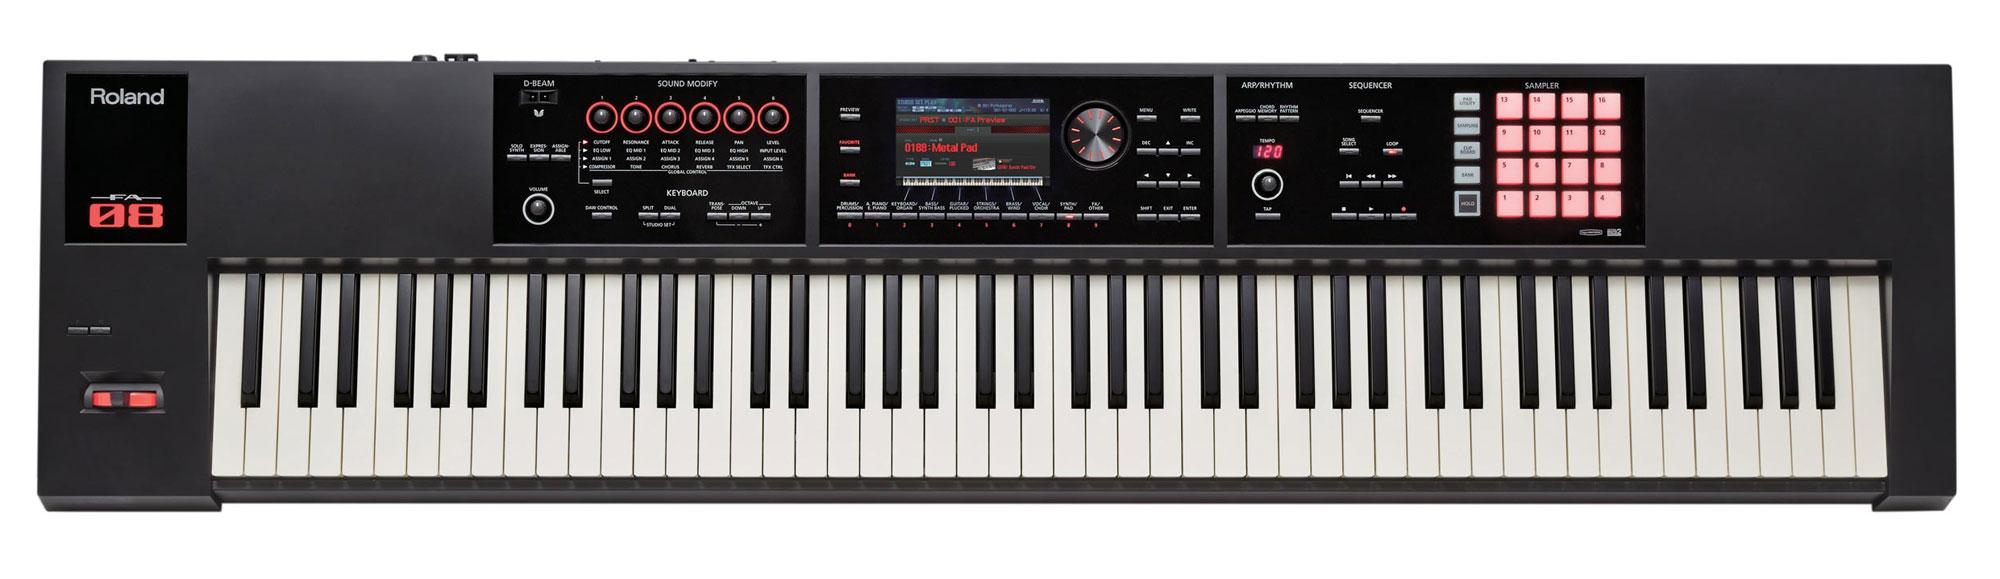 Synthesizer - Roland FA 08 Synthesizer Workstation 88 Tasten Ivory Feel - Onlineshop Musikhaus Kirstein